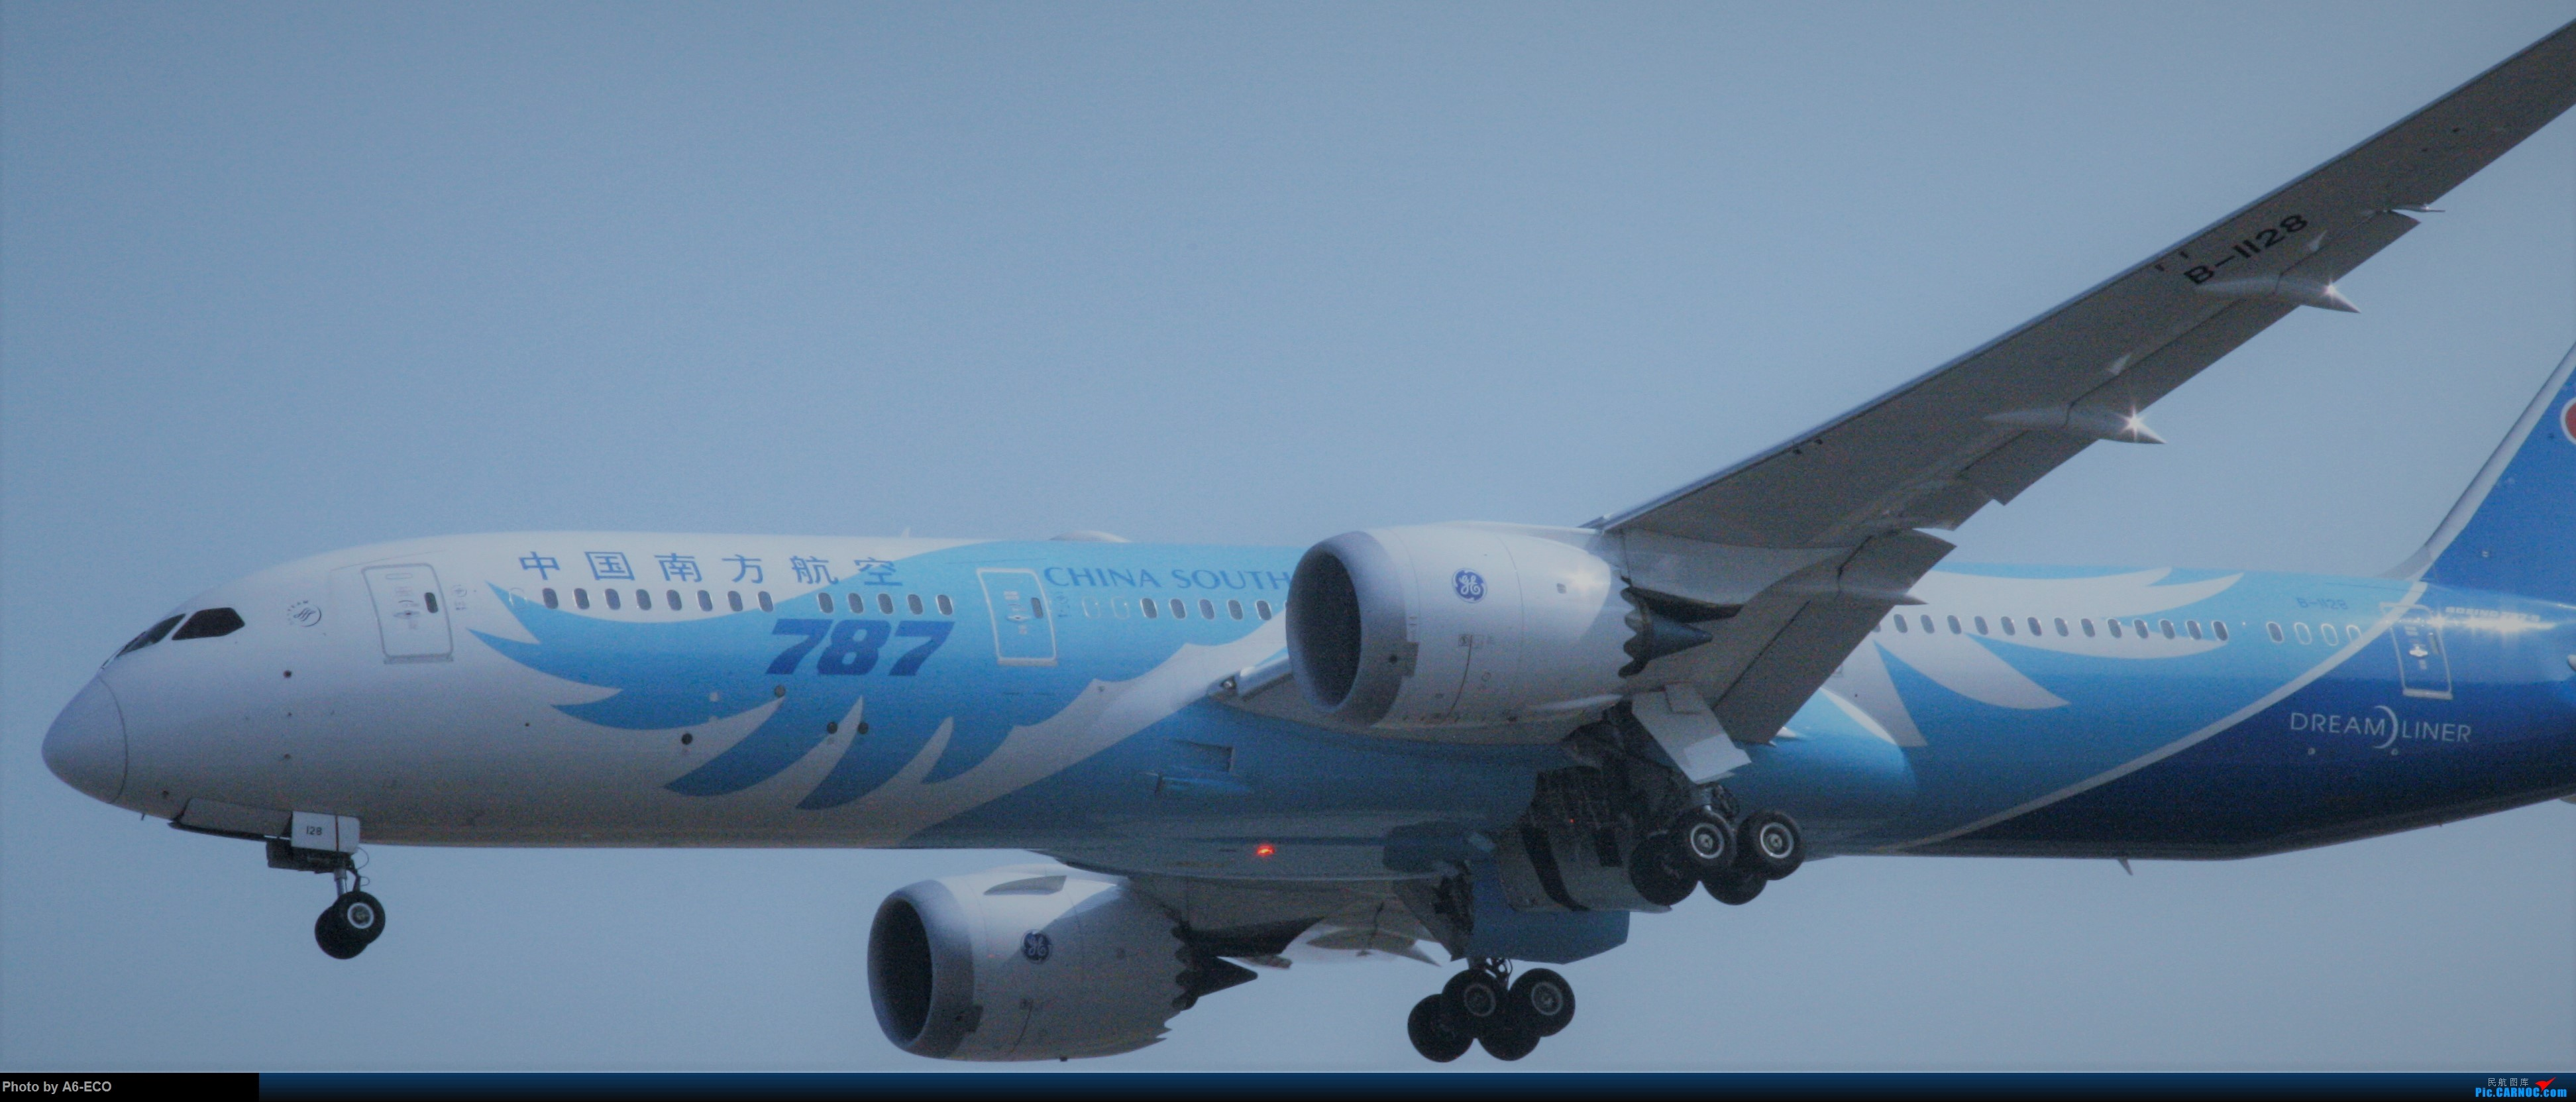 Re:[原创]今天运气极好,云南孔雀,B-1070,2个菜航邮戳,泡菜航彩绘,东航邮戳...... BOEING 787-9 B-1128 中国北京首都国际机场